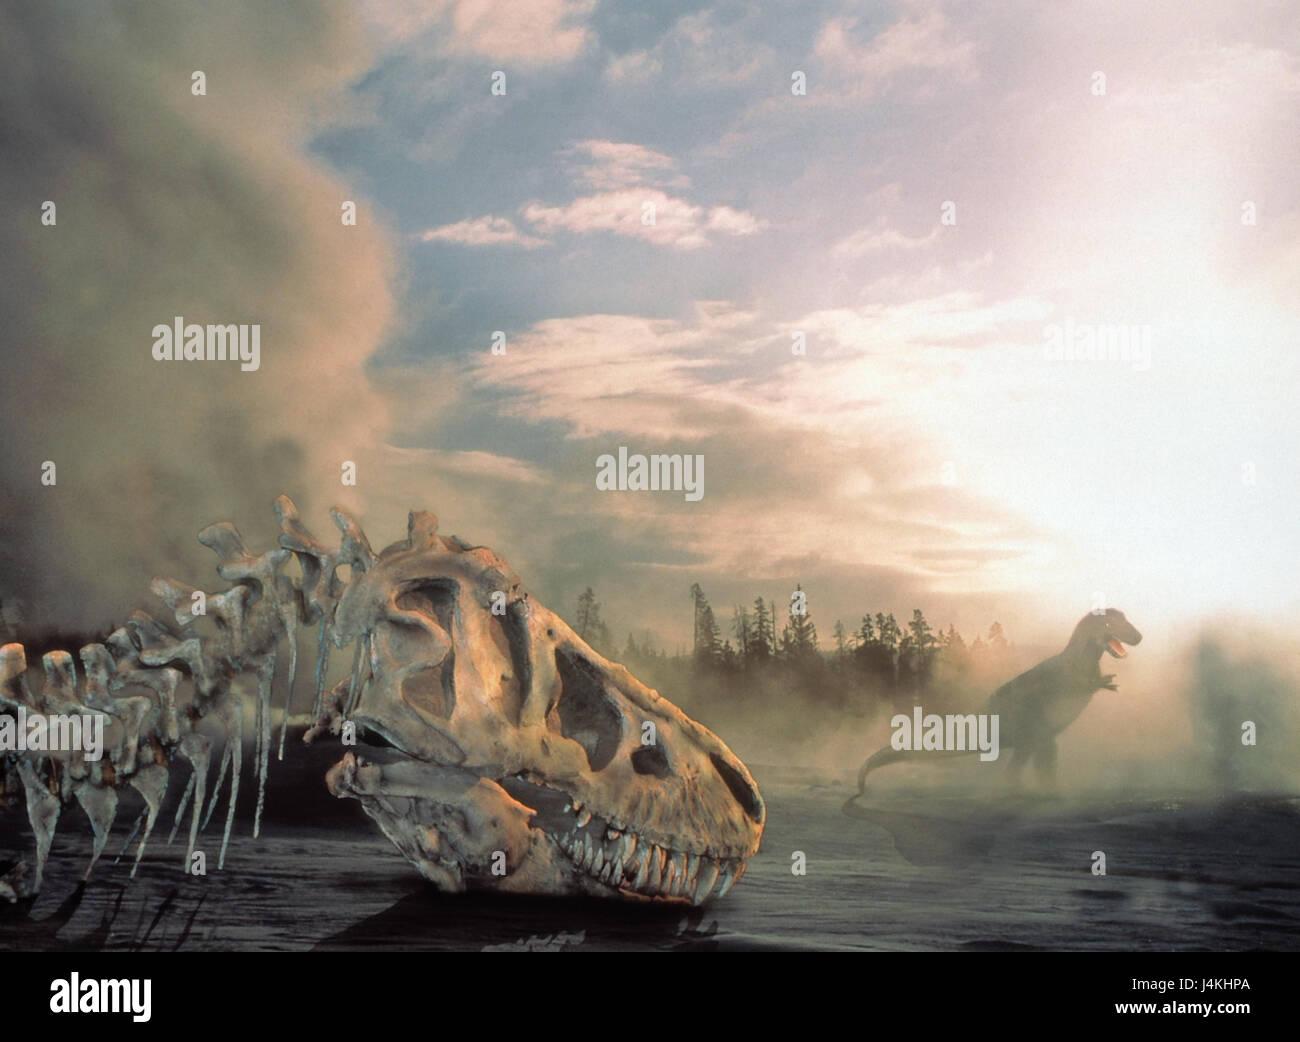 Scenery, simulations, dinosaurs, dinosaur skeleton, fog primeval times, primordial animals, prehistorically, wood, - Stock Image